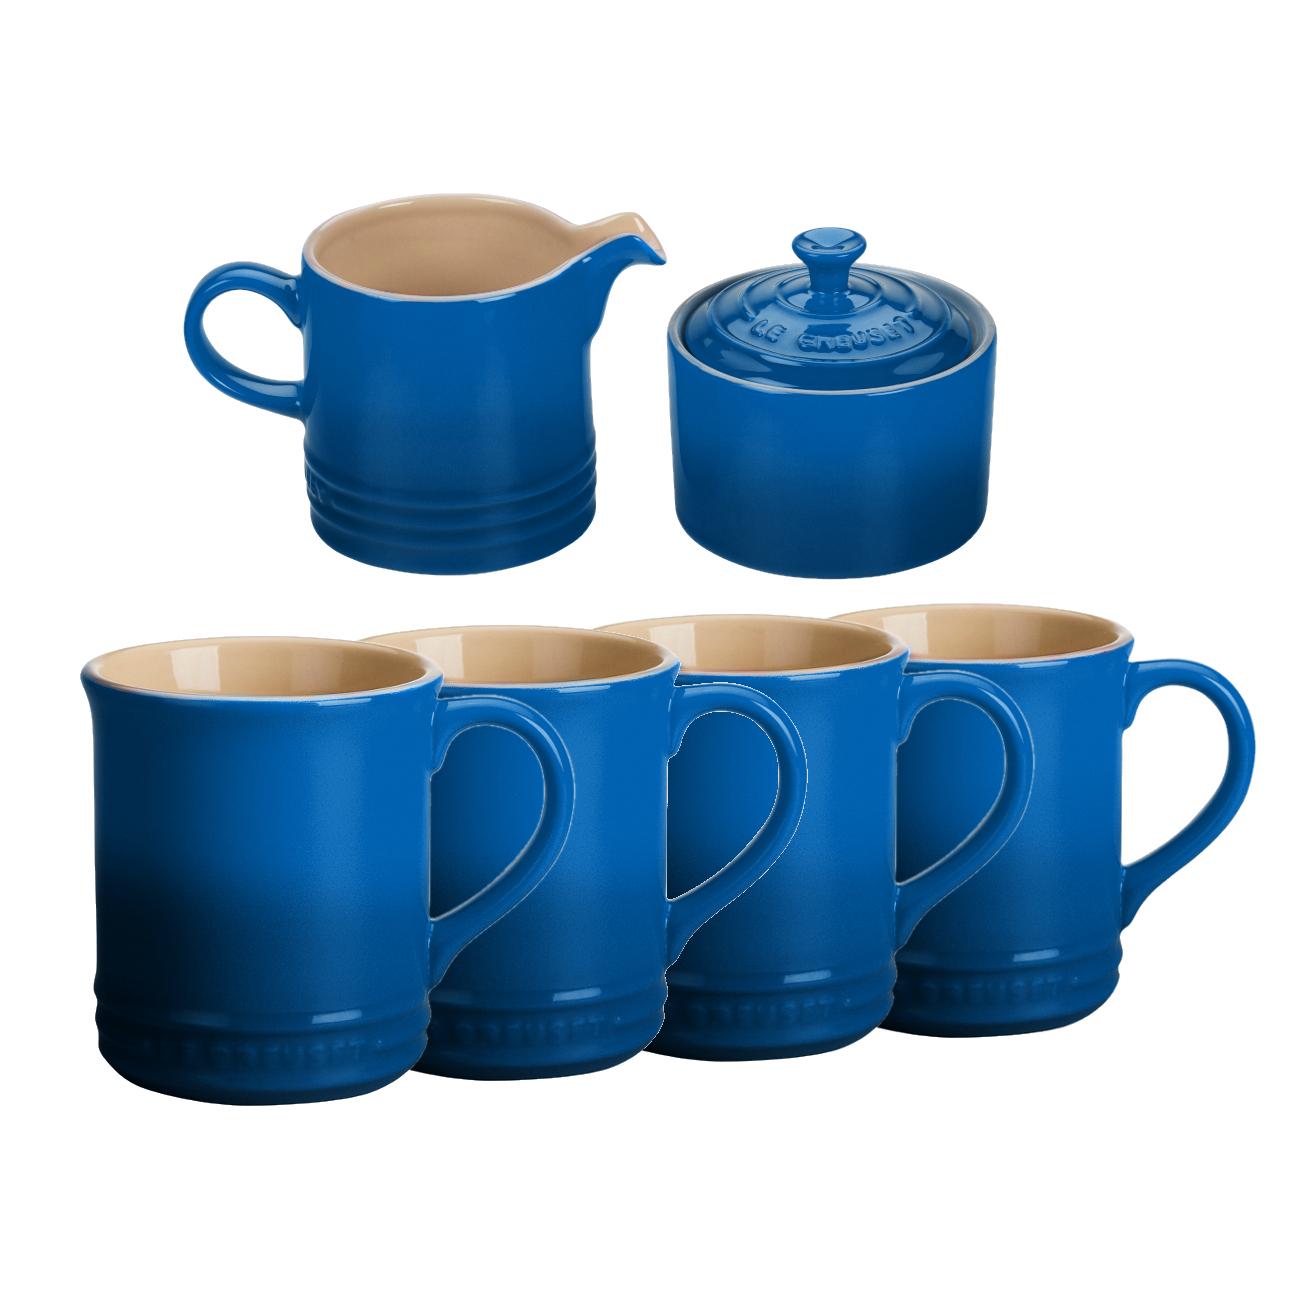 Le Creuset Marseille Blue Stoneware 6 Piece Coffee or Tea Service Set with Mugs and Cream & Sugar Set